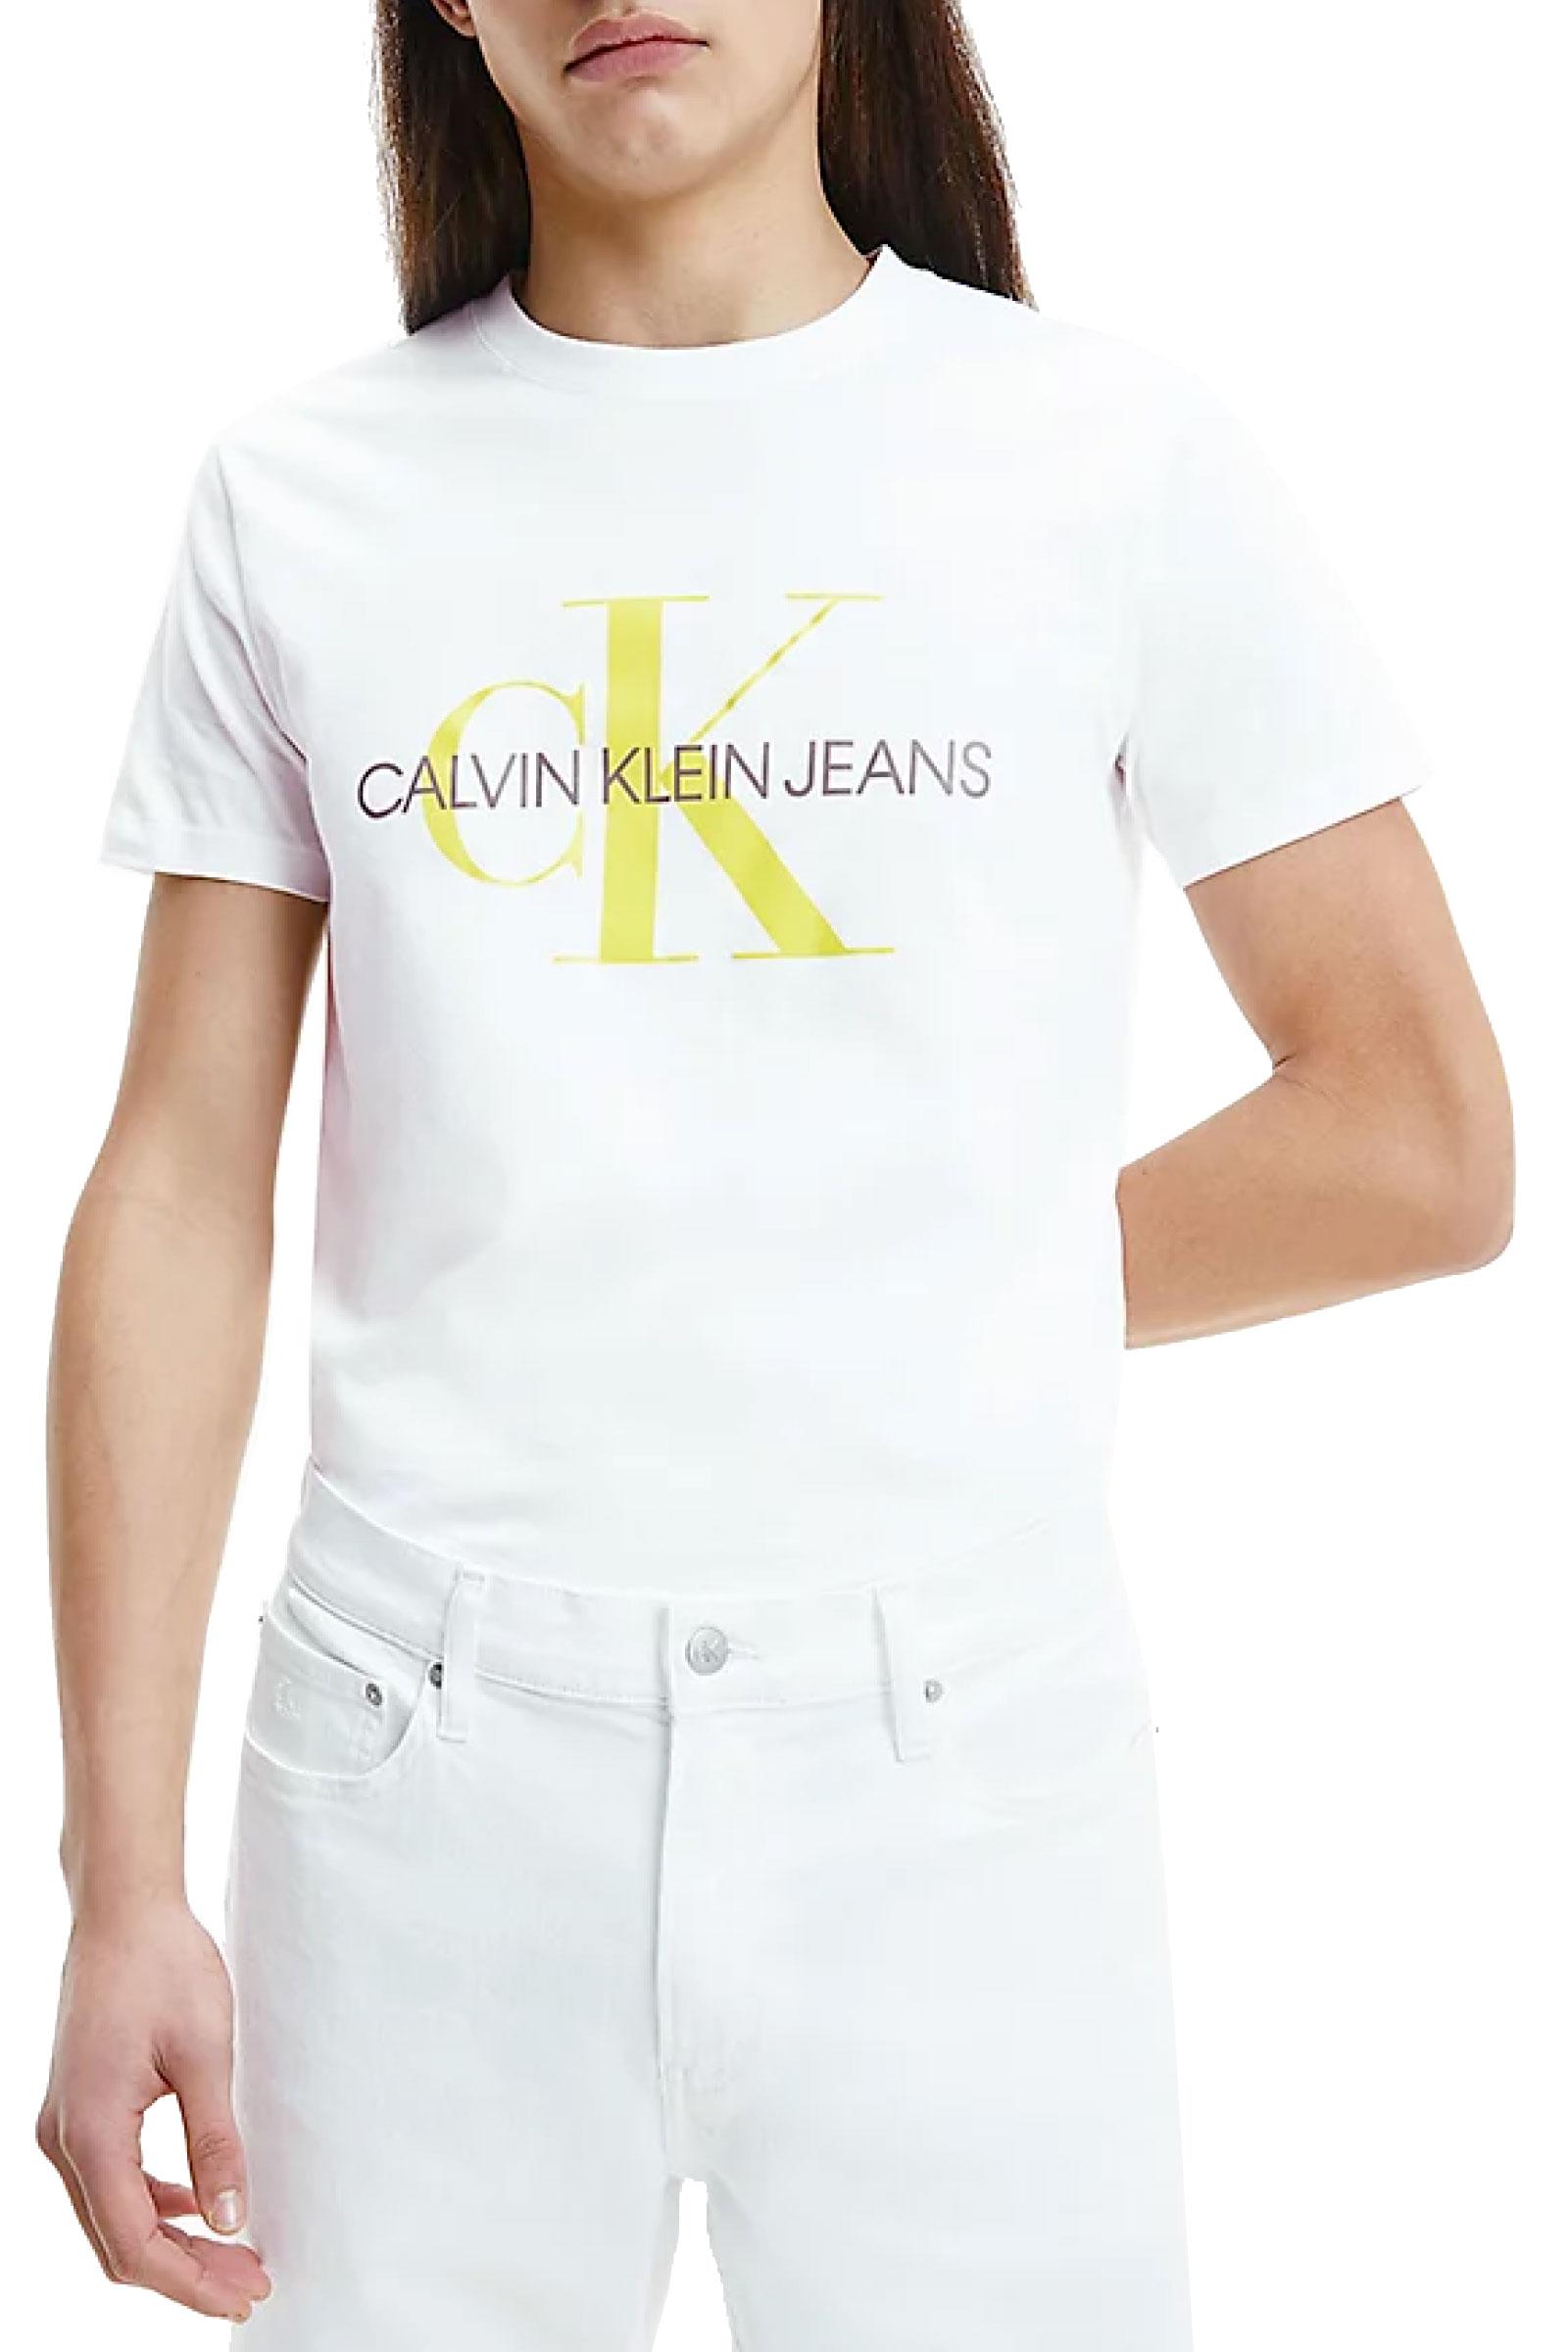 CALVIN KLEIN JEANS | T-Shirt | J30J3170650K8